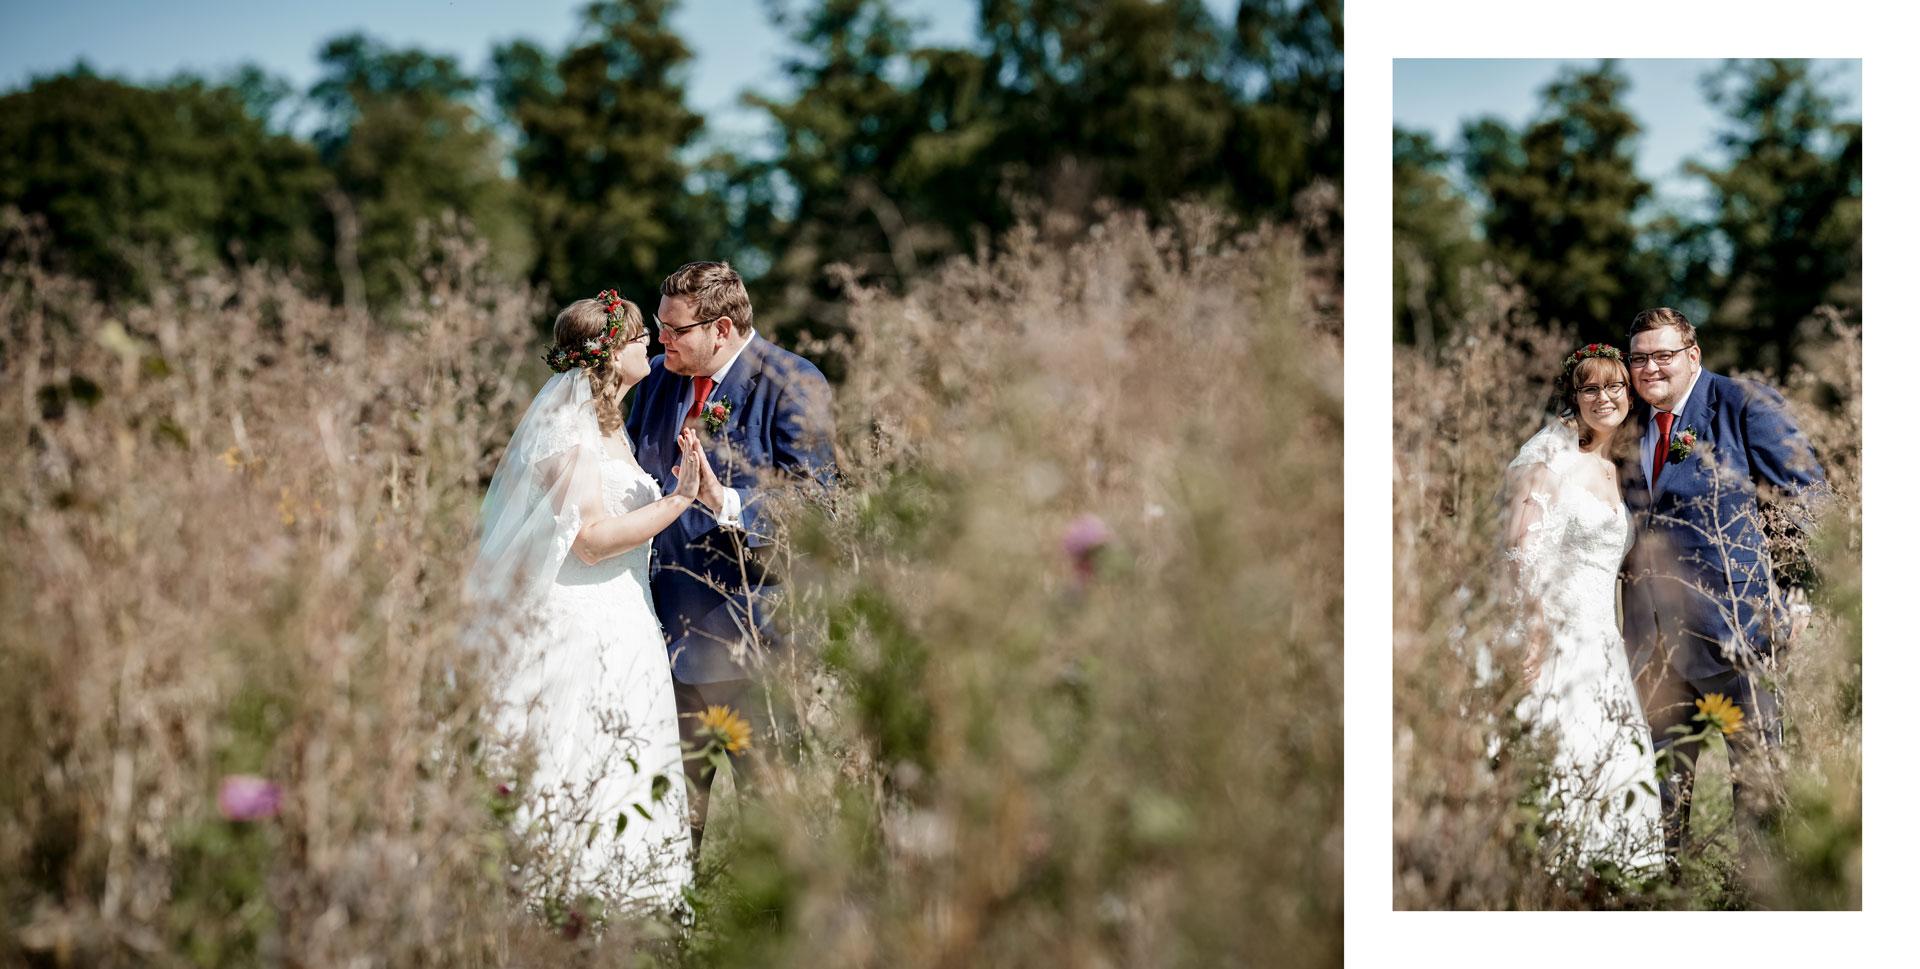 Hochzeitsfotograf Bohmte